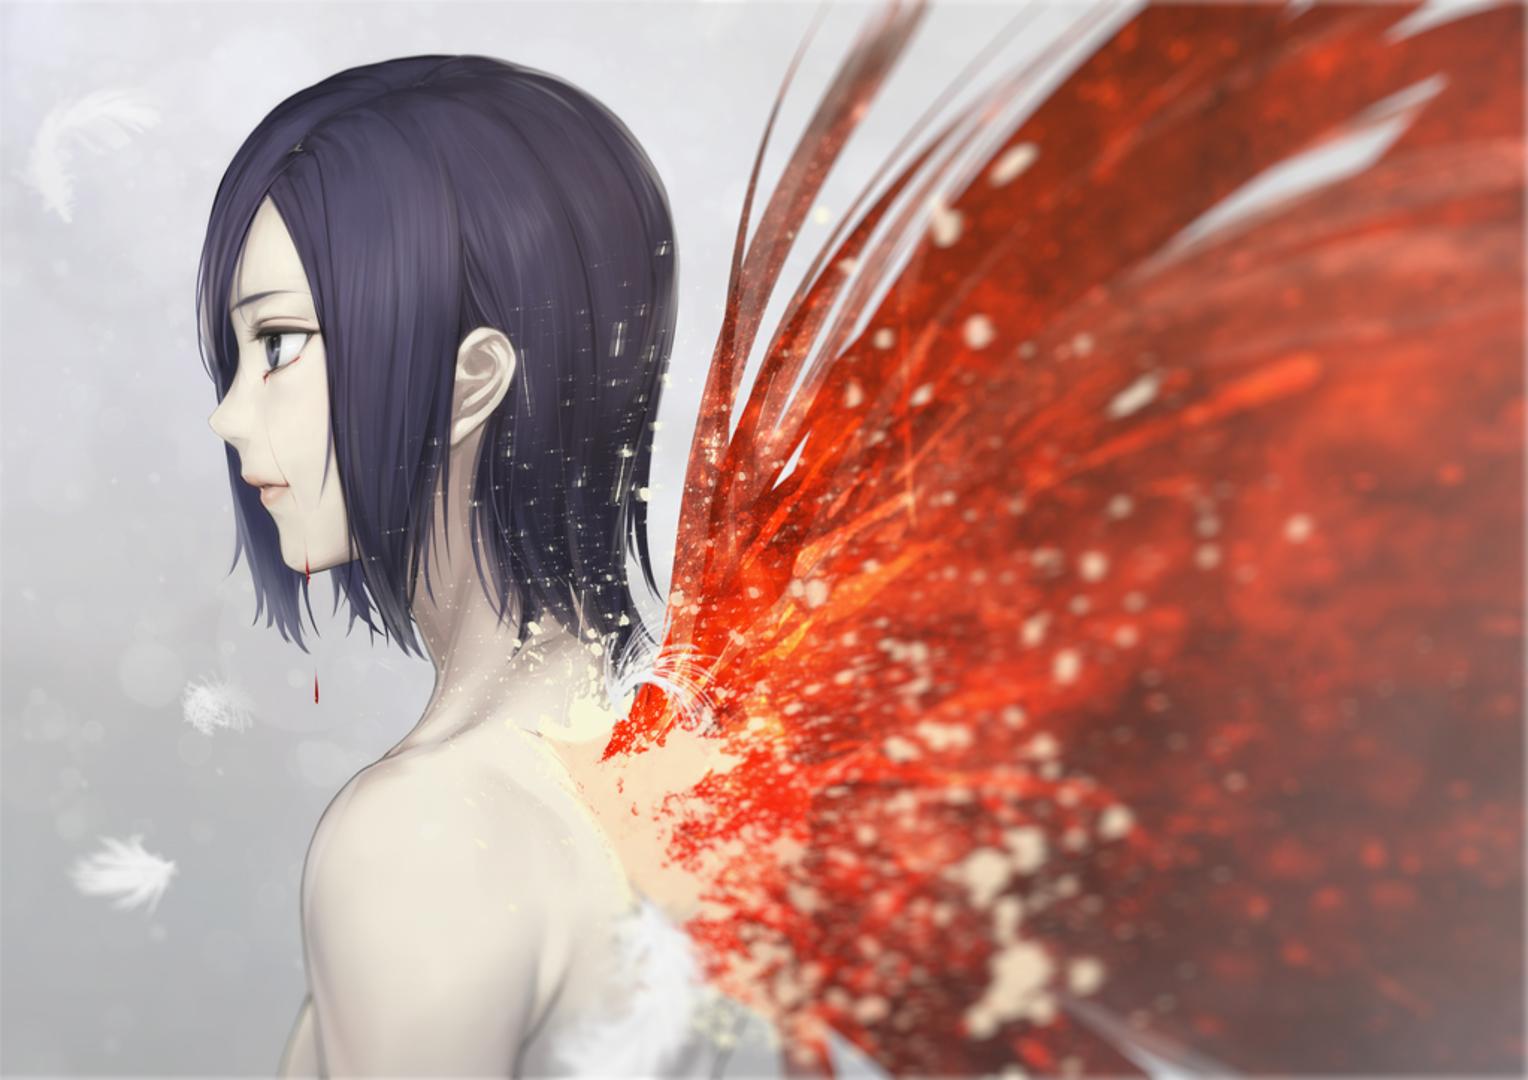 Tokyo Ghoul Touka Kirishima Wings Blood Crying